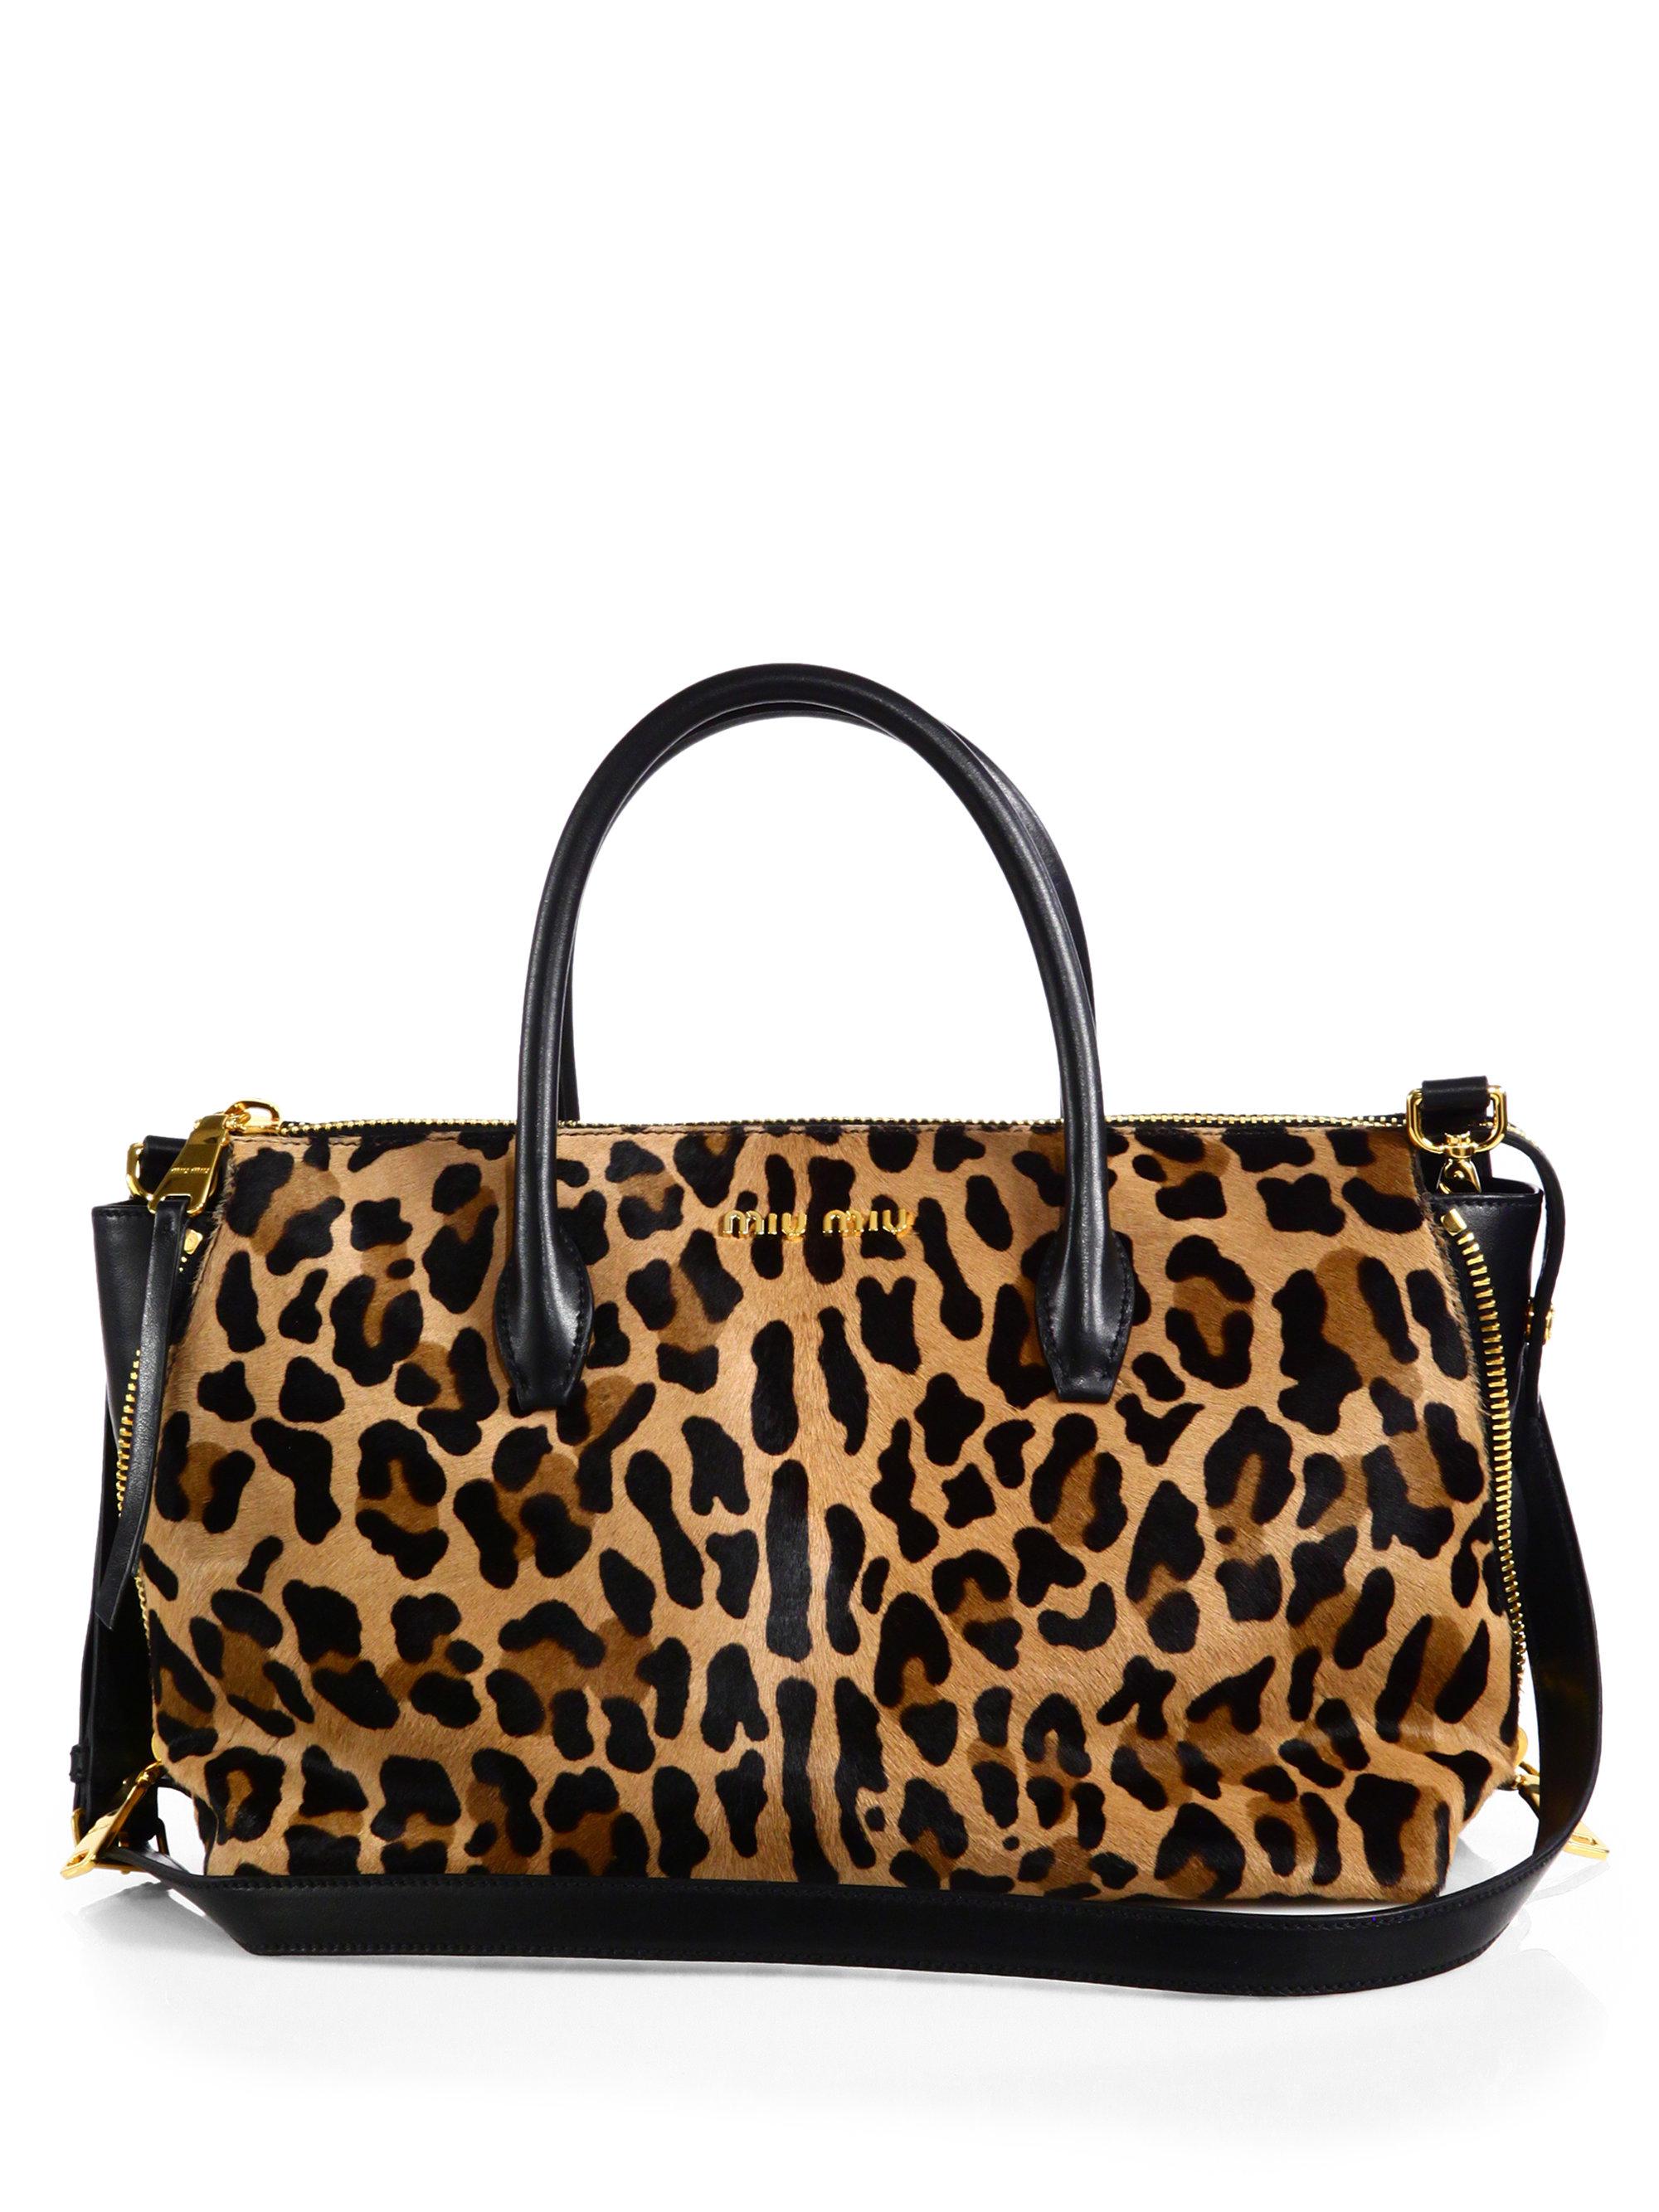 Miu Miu Cavallino Leopardprint Calf Hair Small Bowler Bag ...